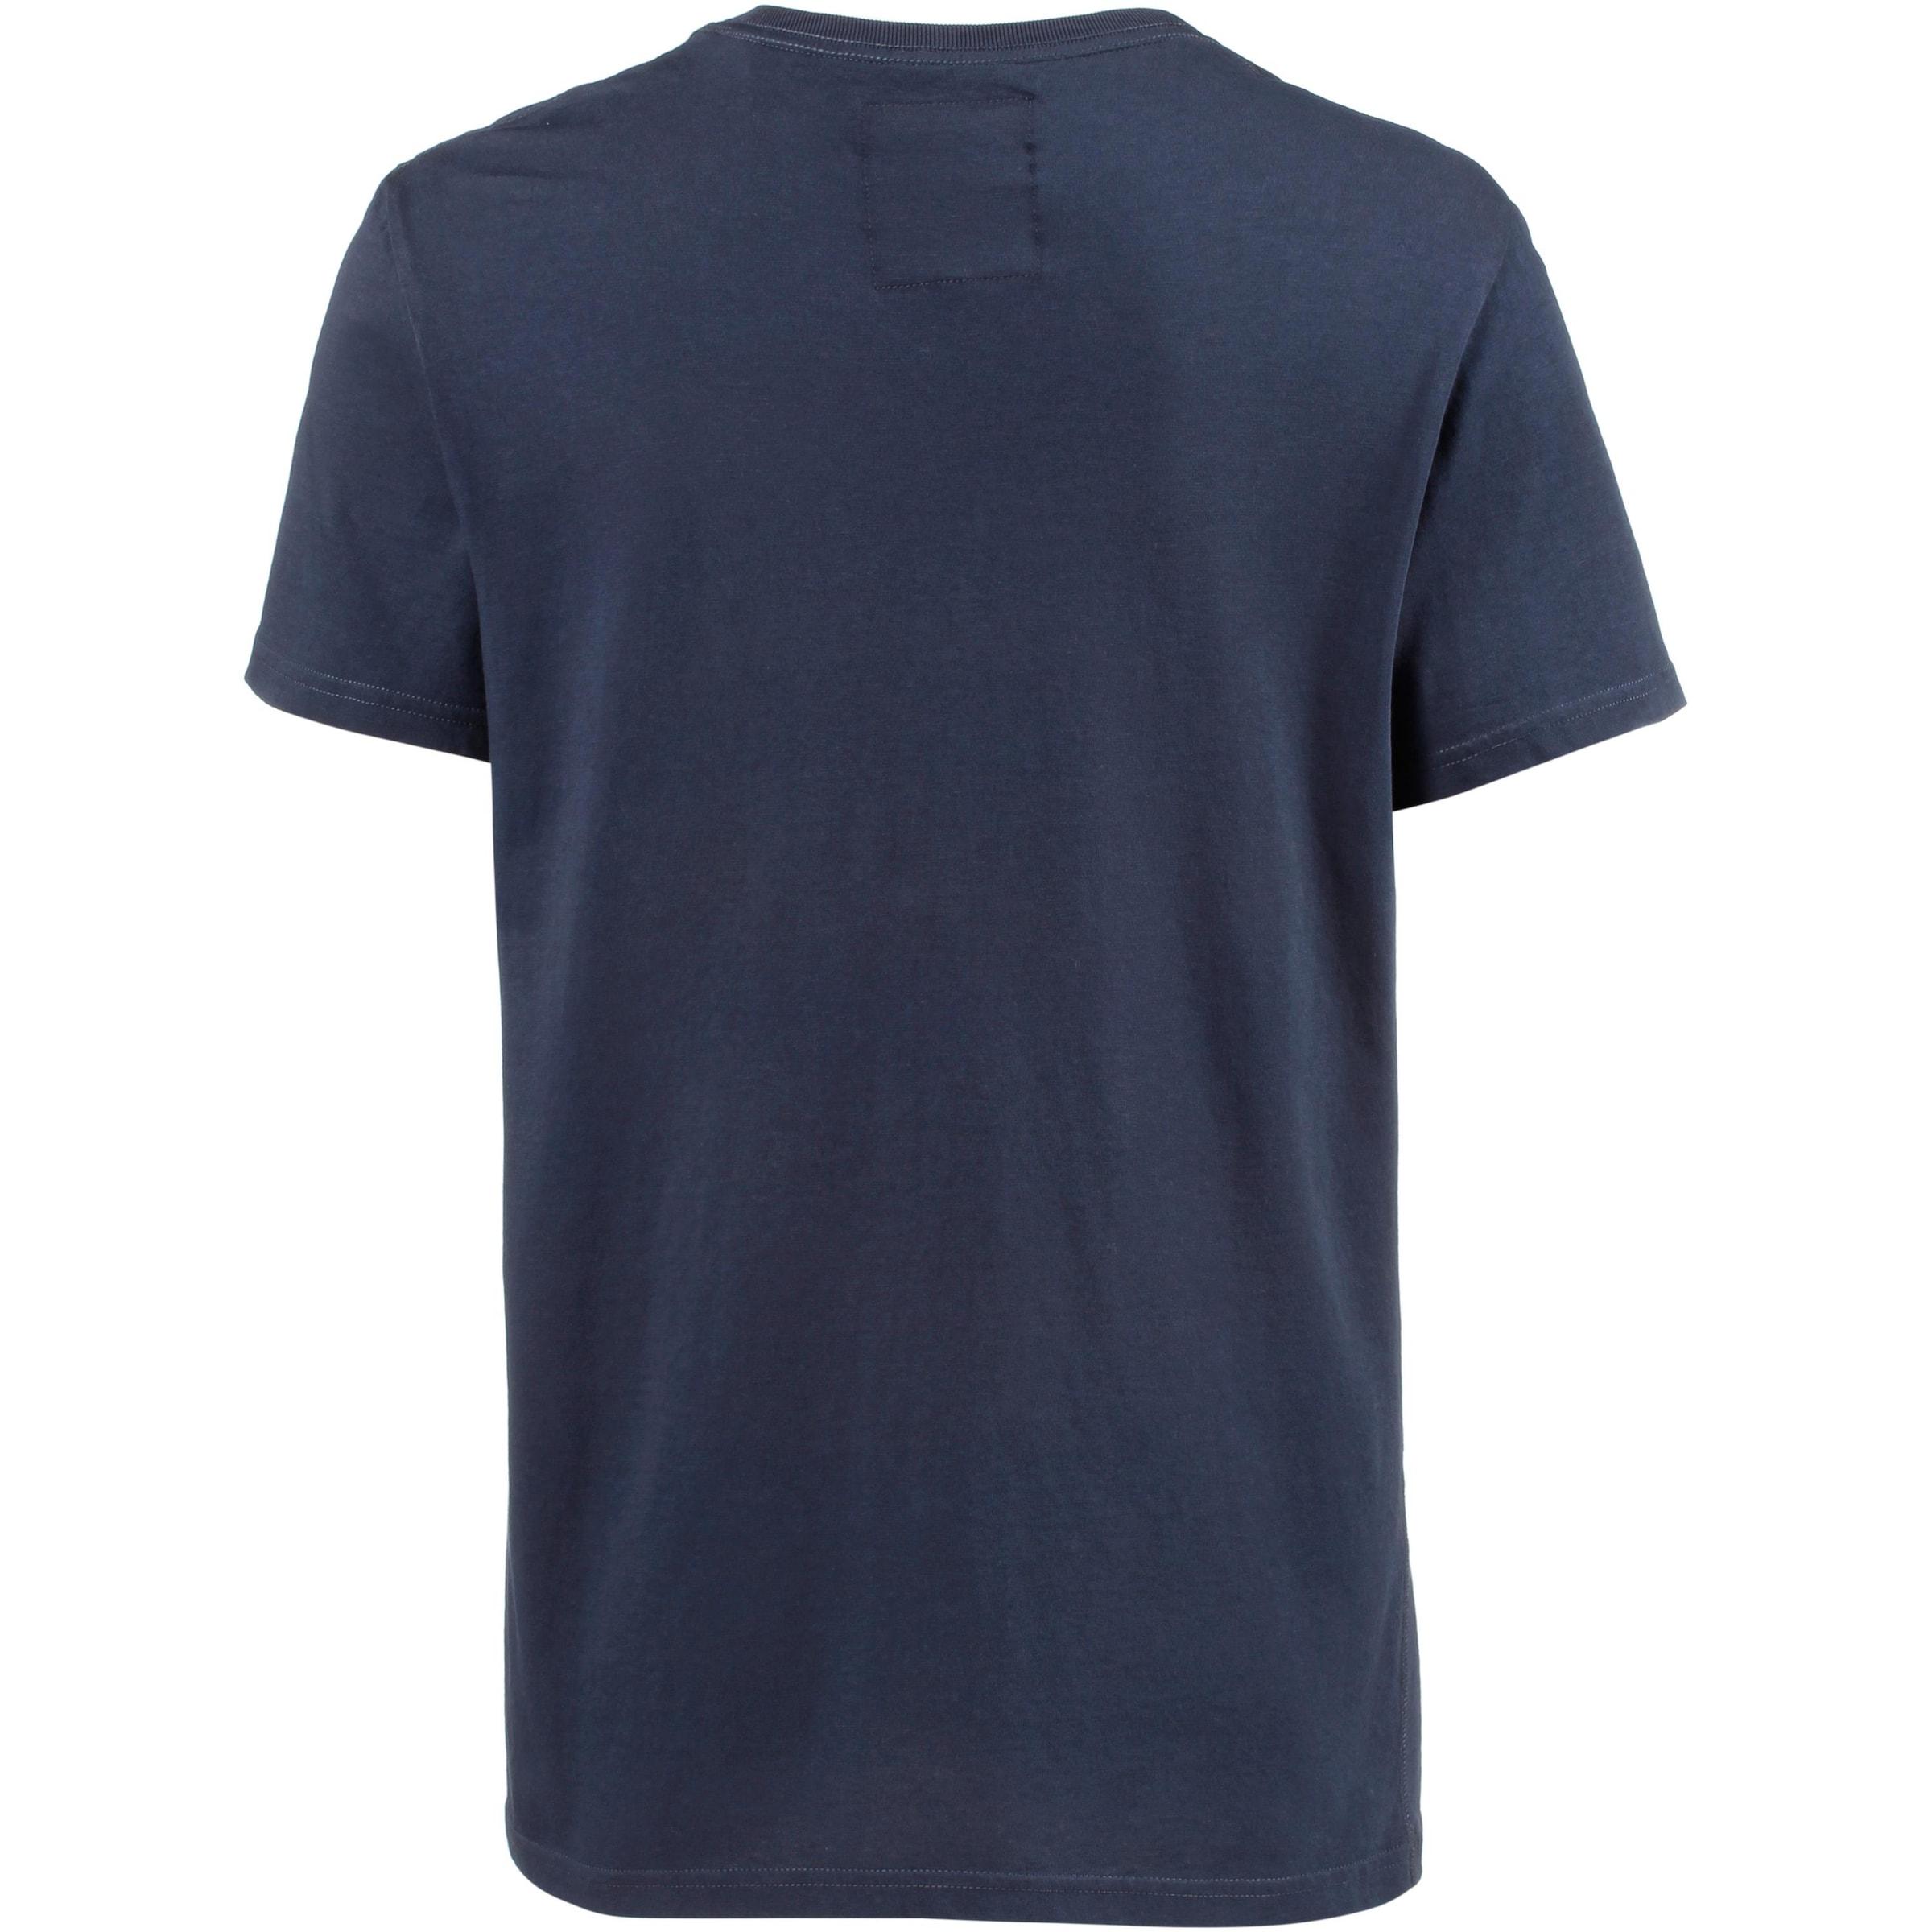 Superdry Printshirt Herren Auslass Großhandelspreis IoPCWzTI